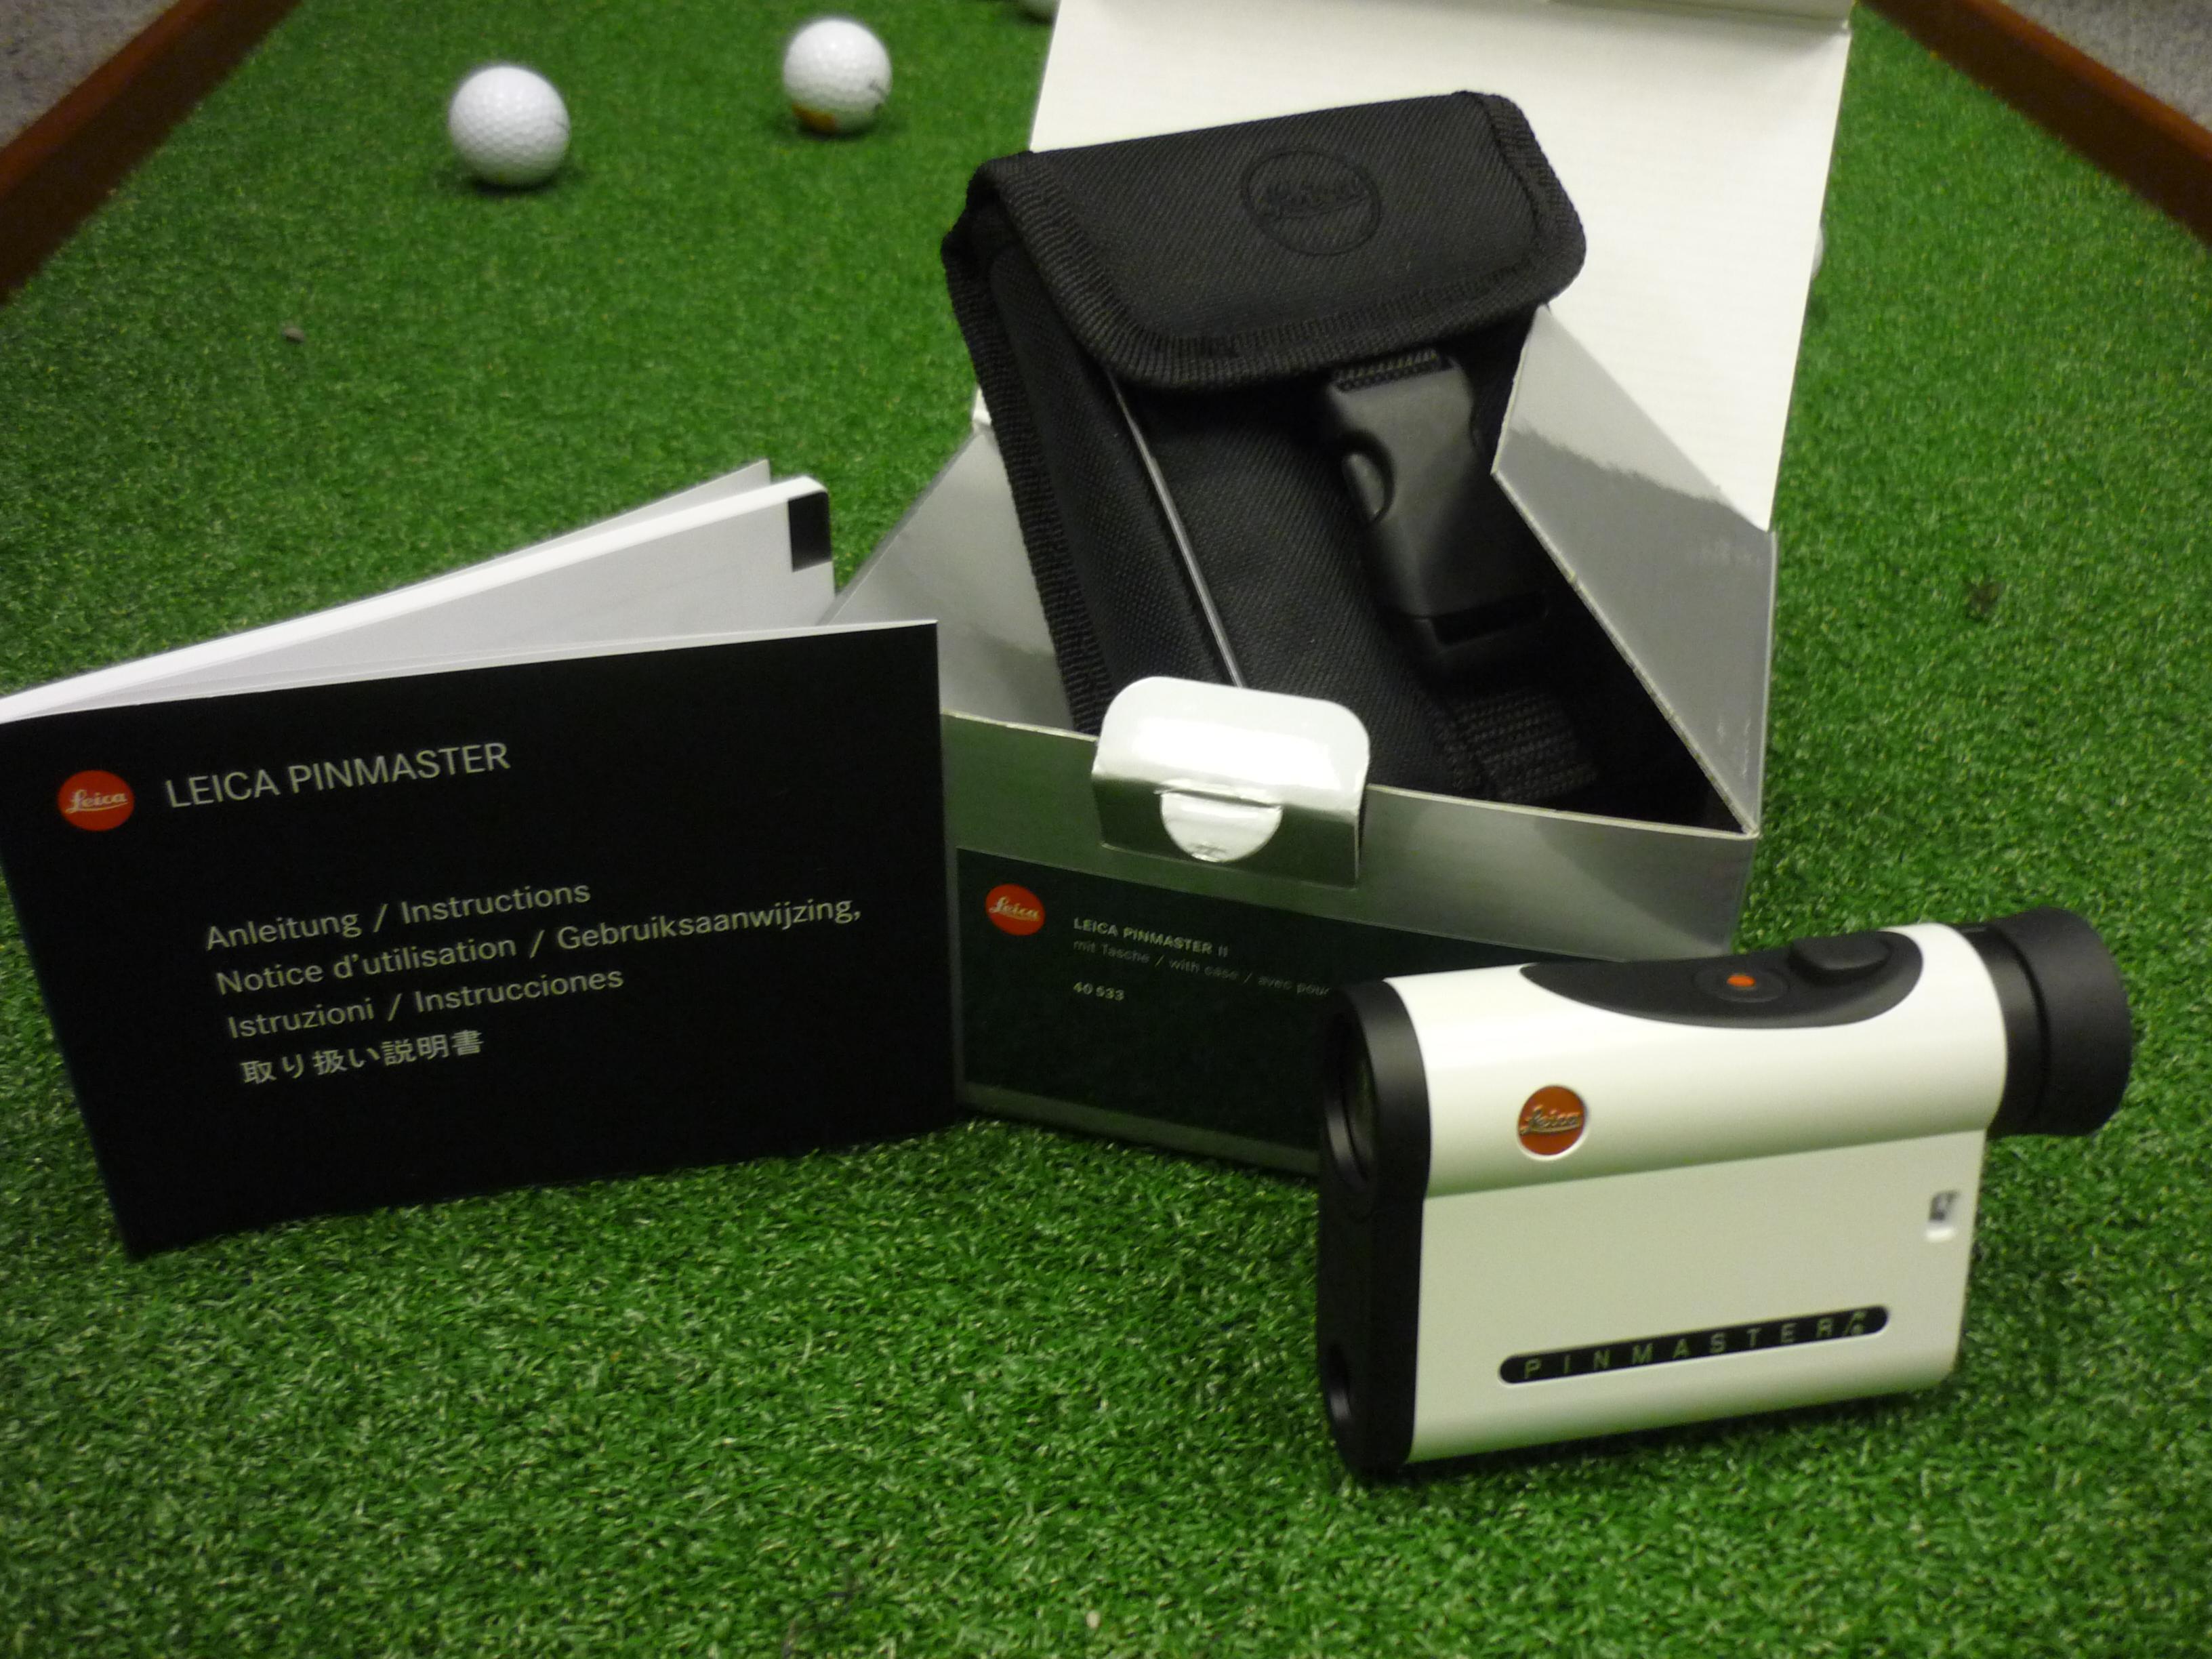 Leica Entfernungsmesser Golf : Leica entfernungsmesser pinmaster rangemaster crf neopren